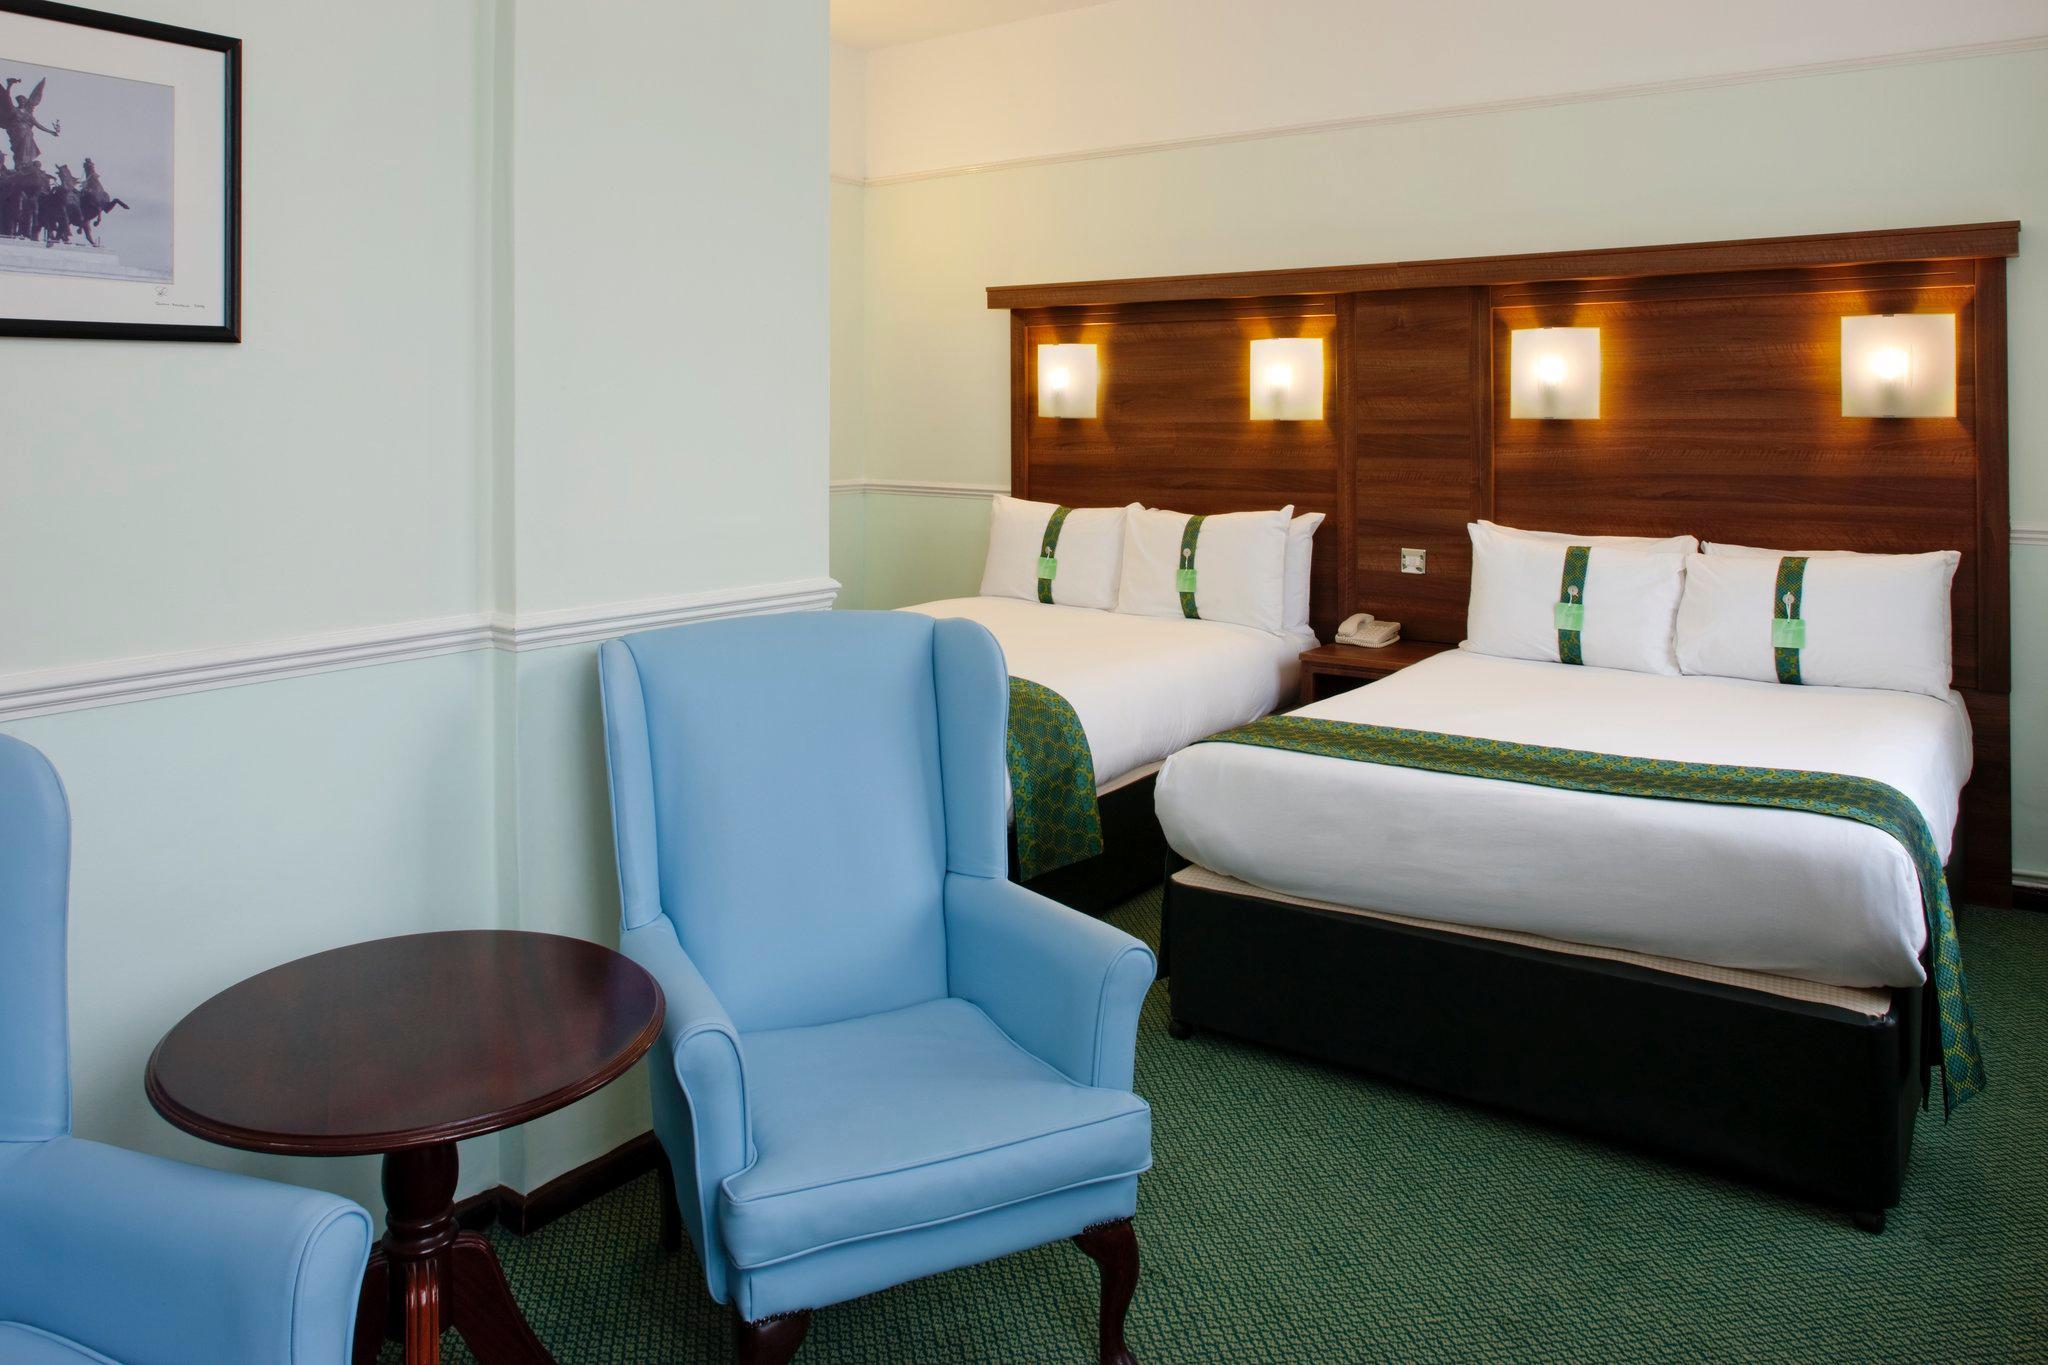 Holiday Inn Oxford Circus